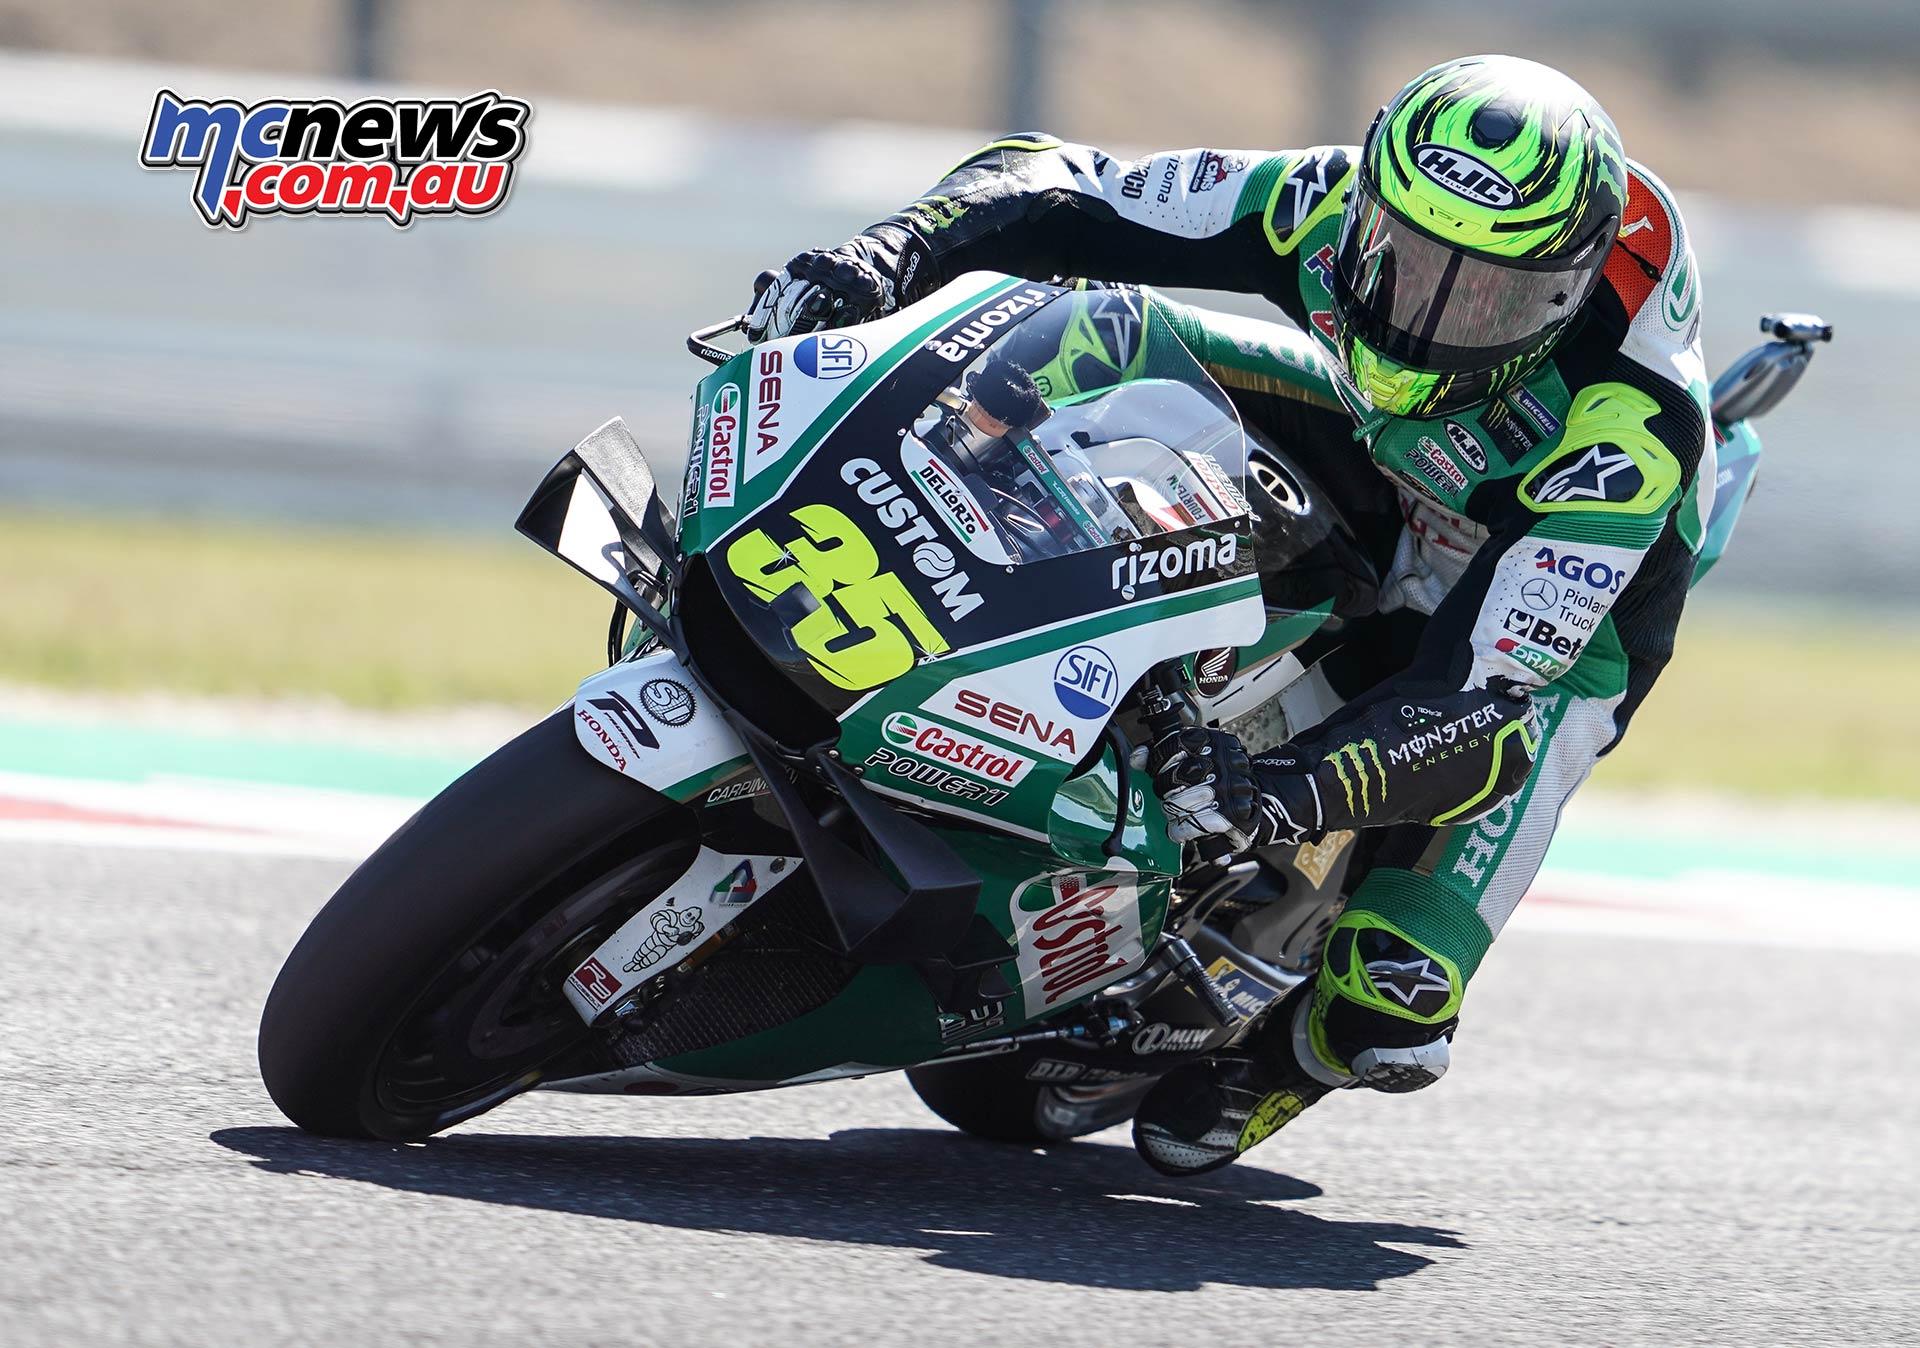 MotoGP Rnd Misano QP Crutchlow